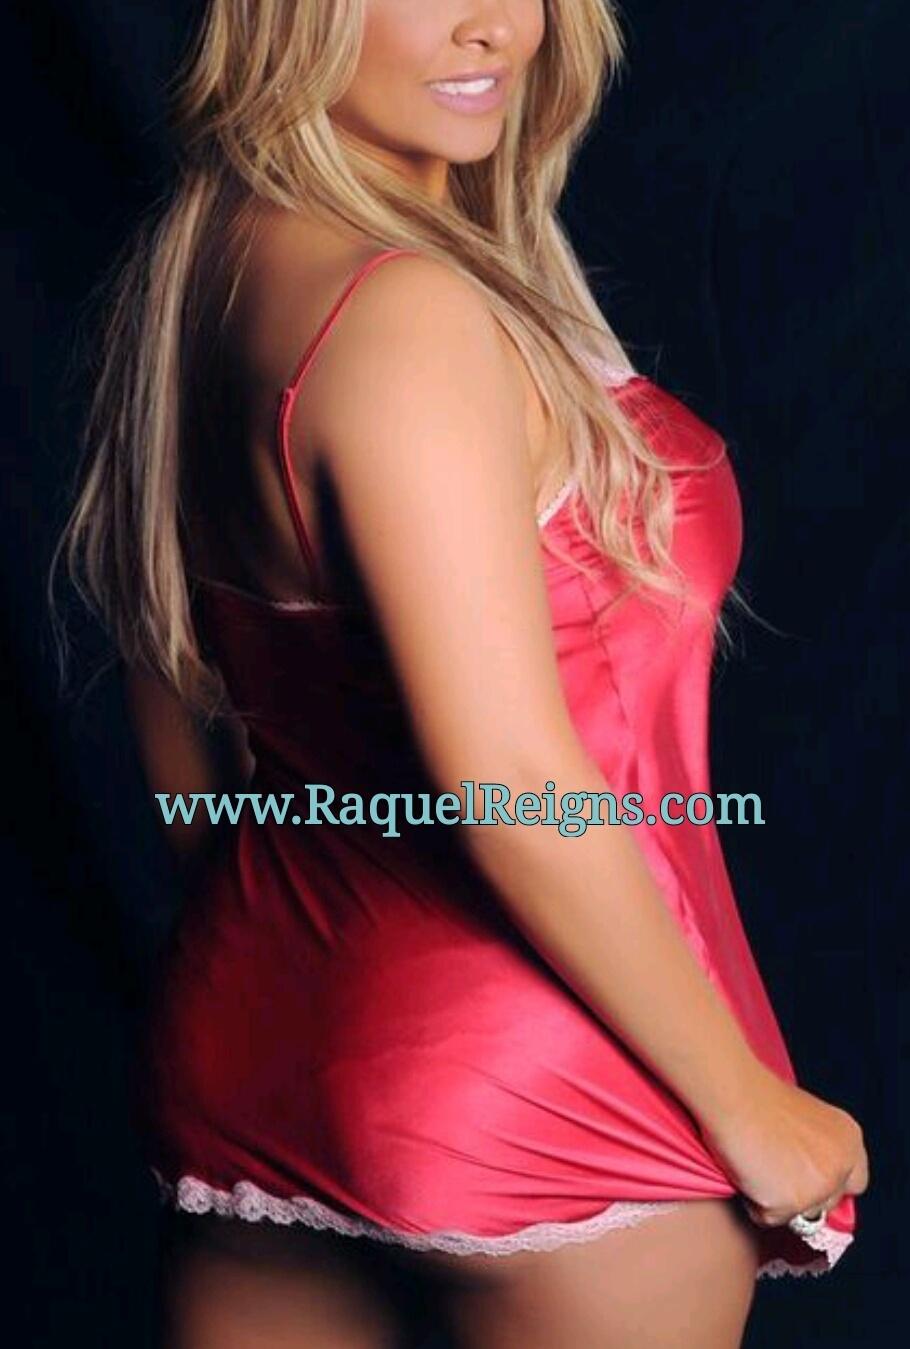 Raquel Reigns